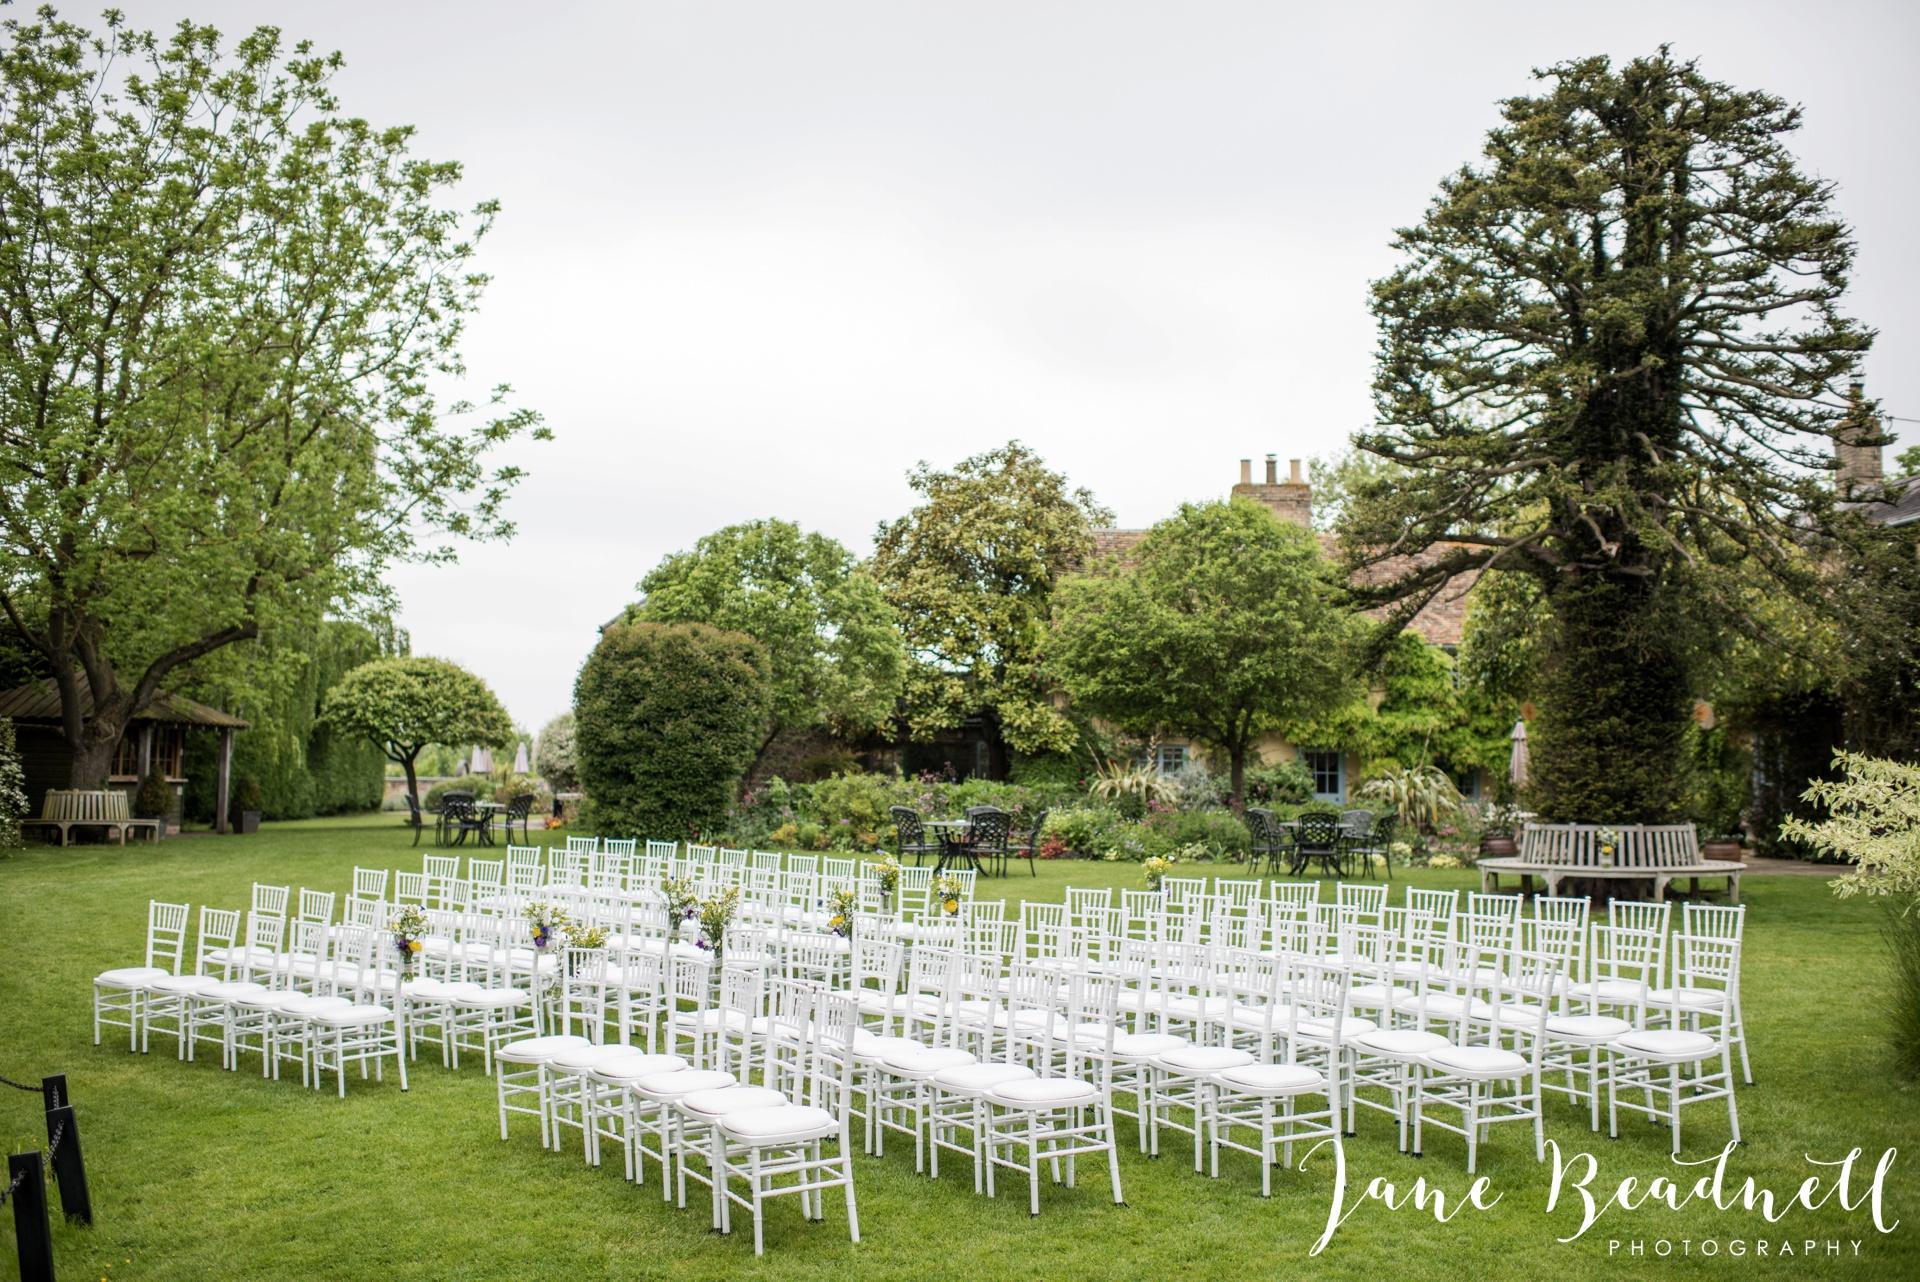 South Farm Wedding photography Hertfordshire by Jane Beadnell Photography fine art wedding photographer_0027